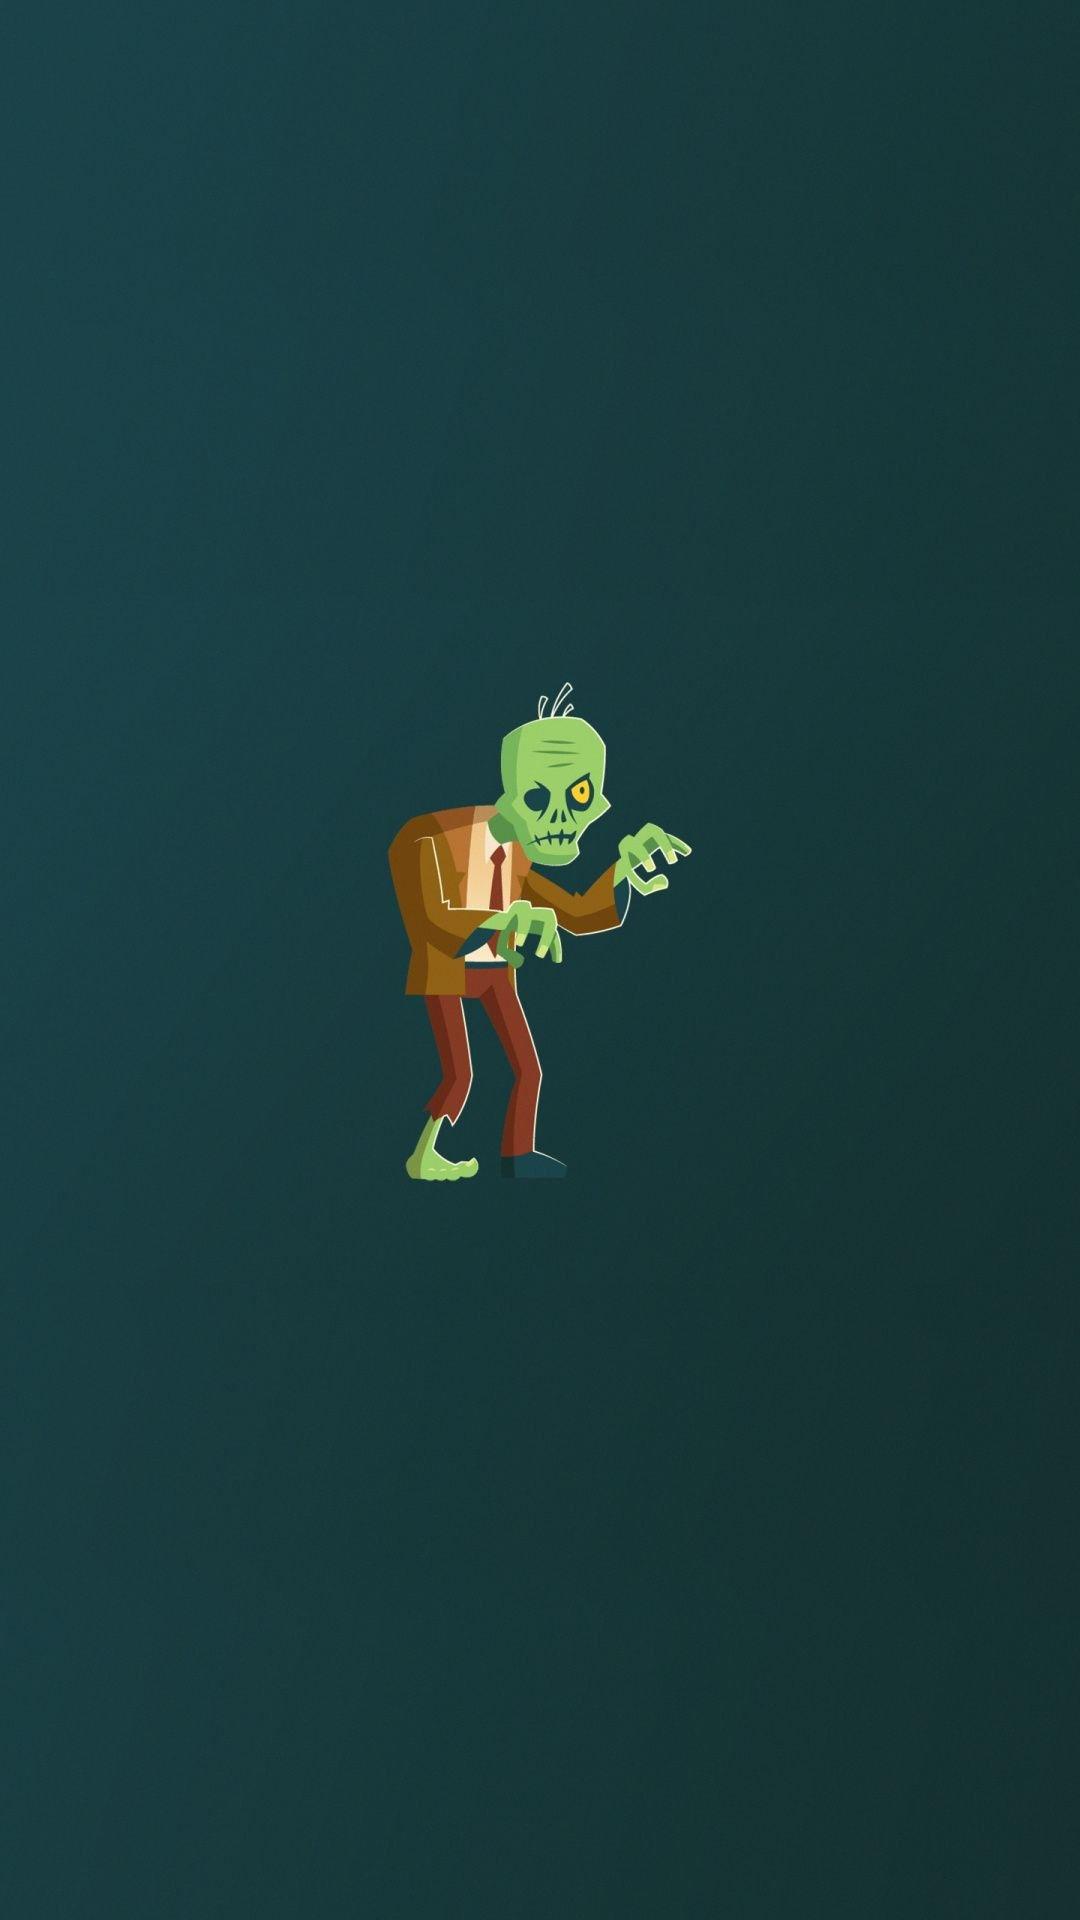 The Minimalism Zombie, Cartoon Wallpaper